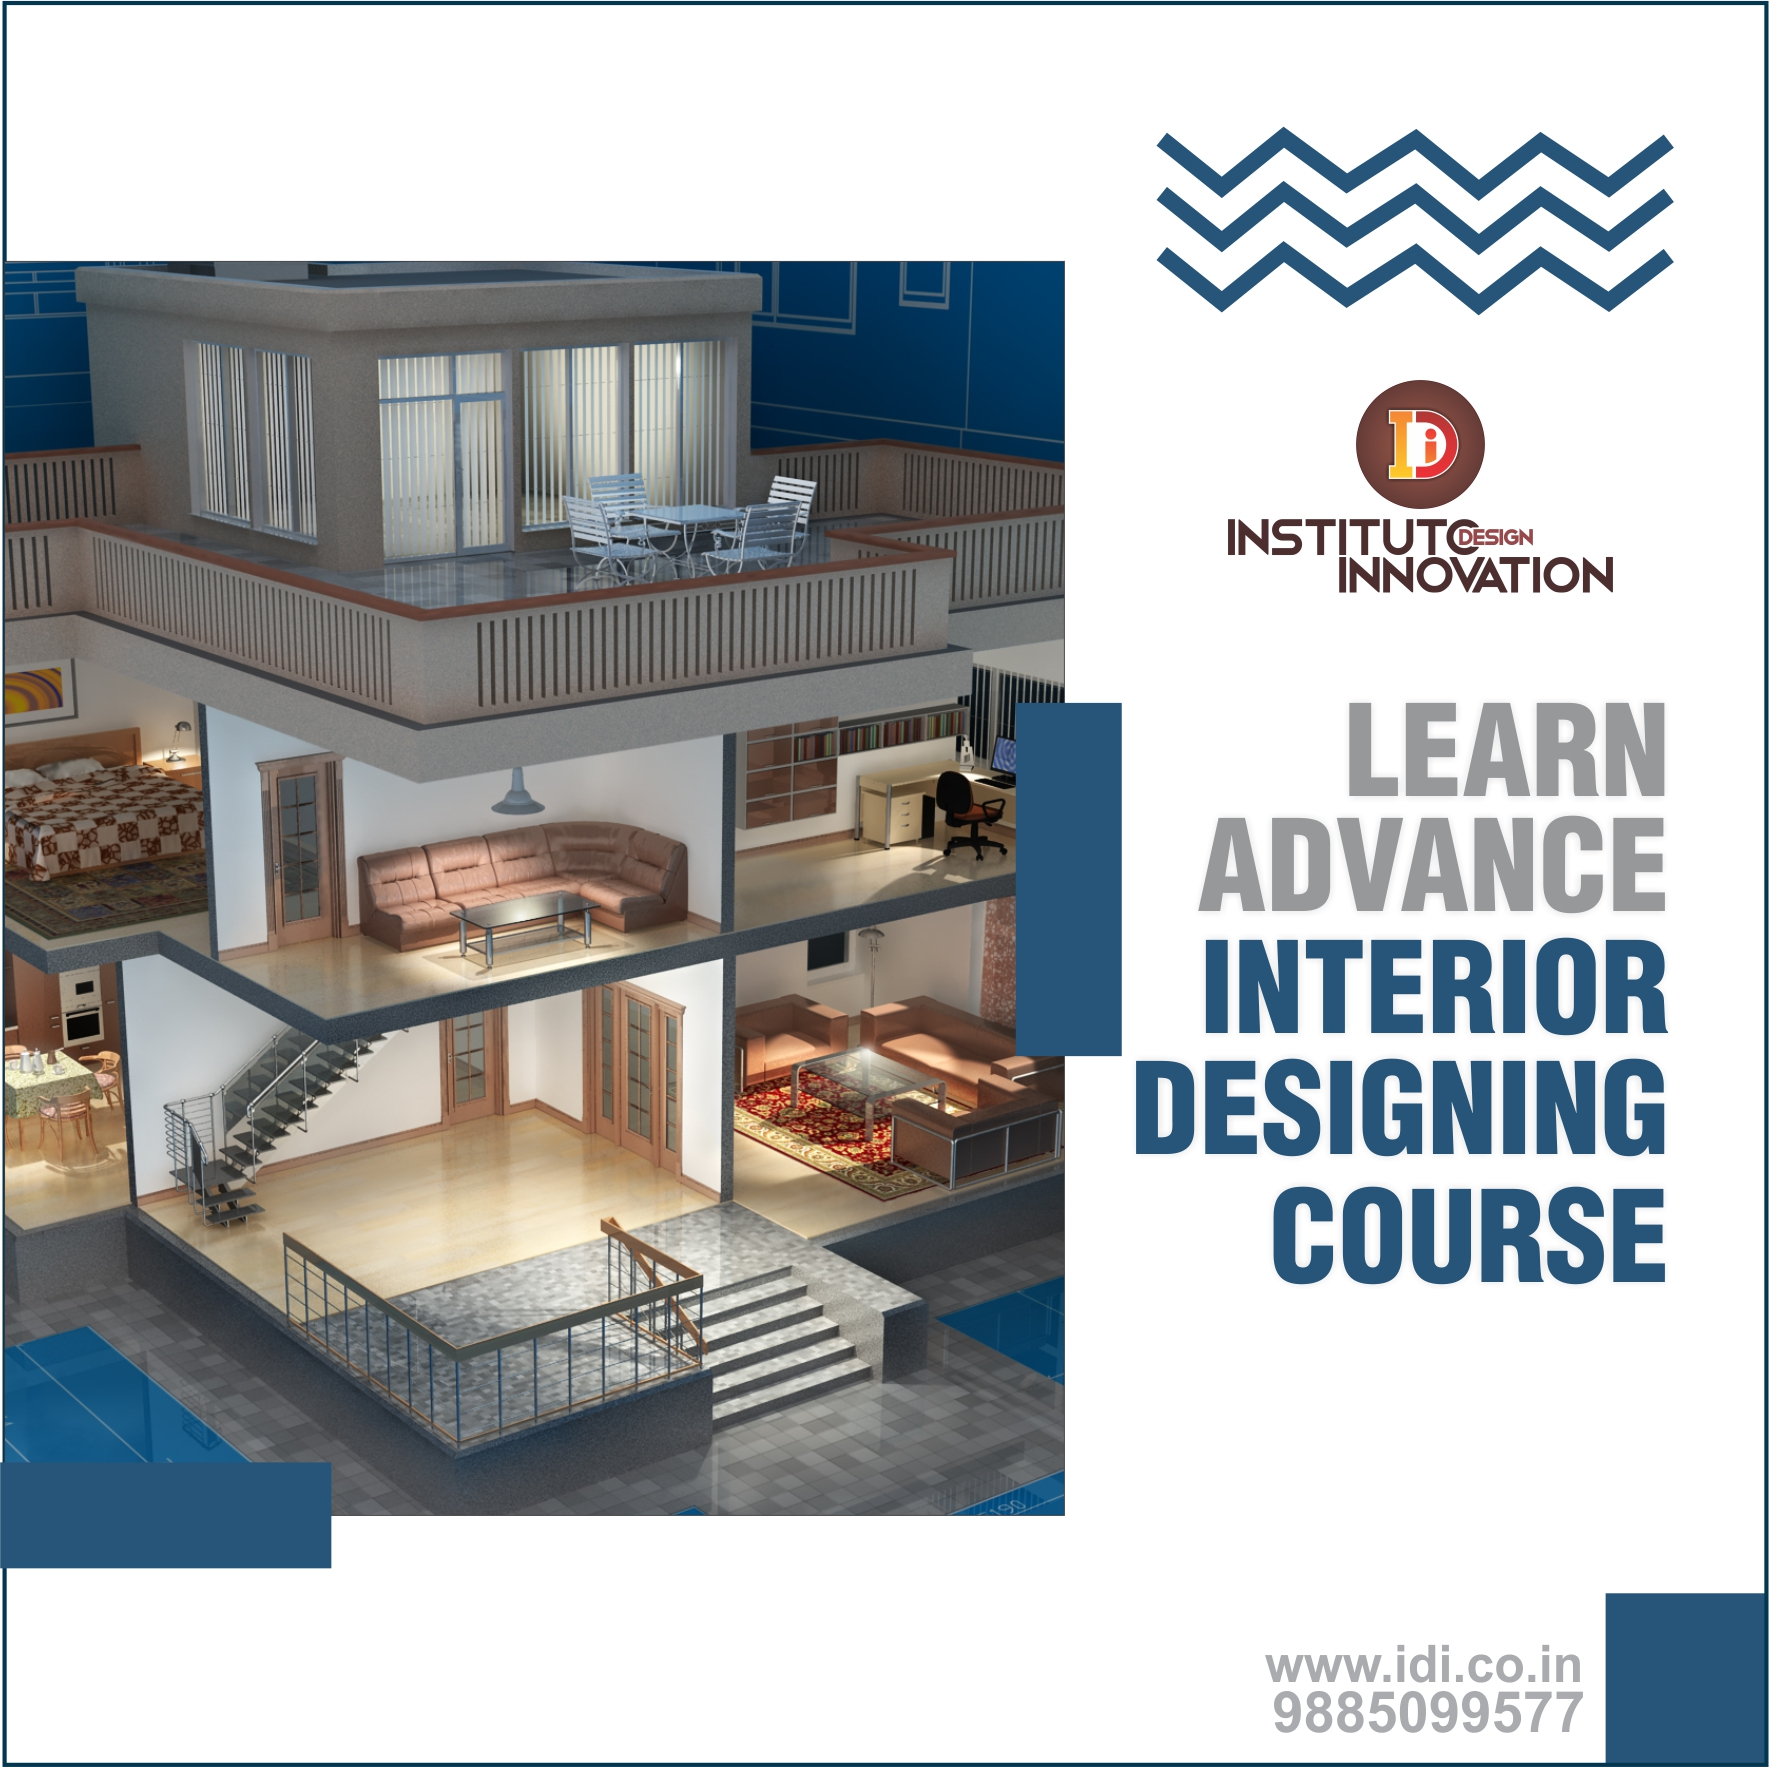 Instituto Design Innovation - Institute of Fashion Interior Design Himayat Nagar-SchoSys.com